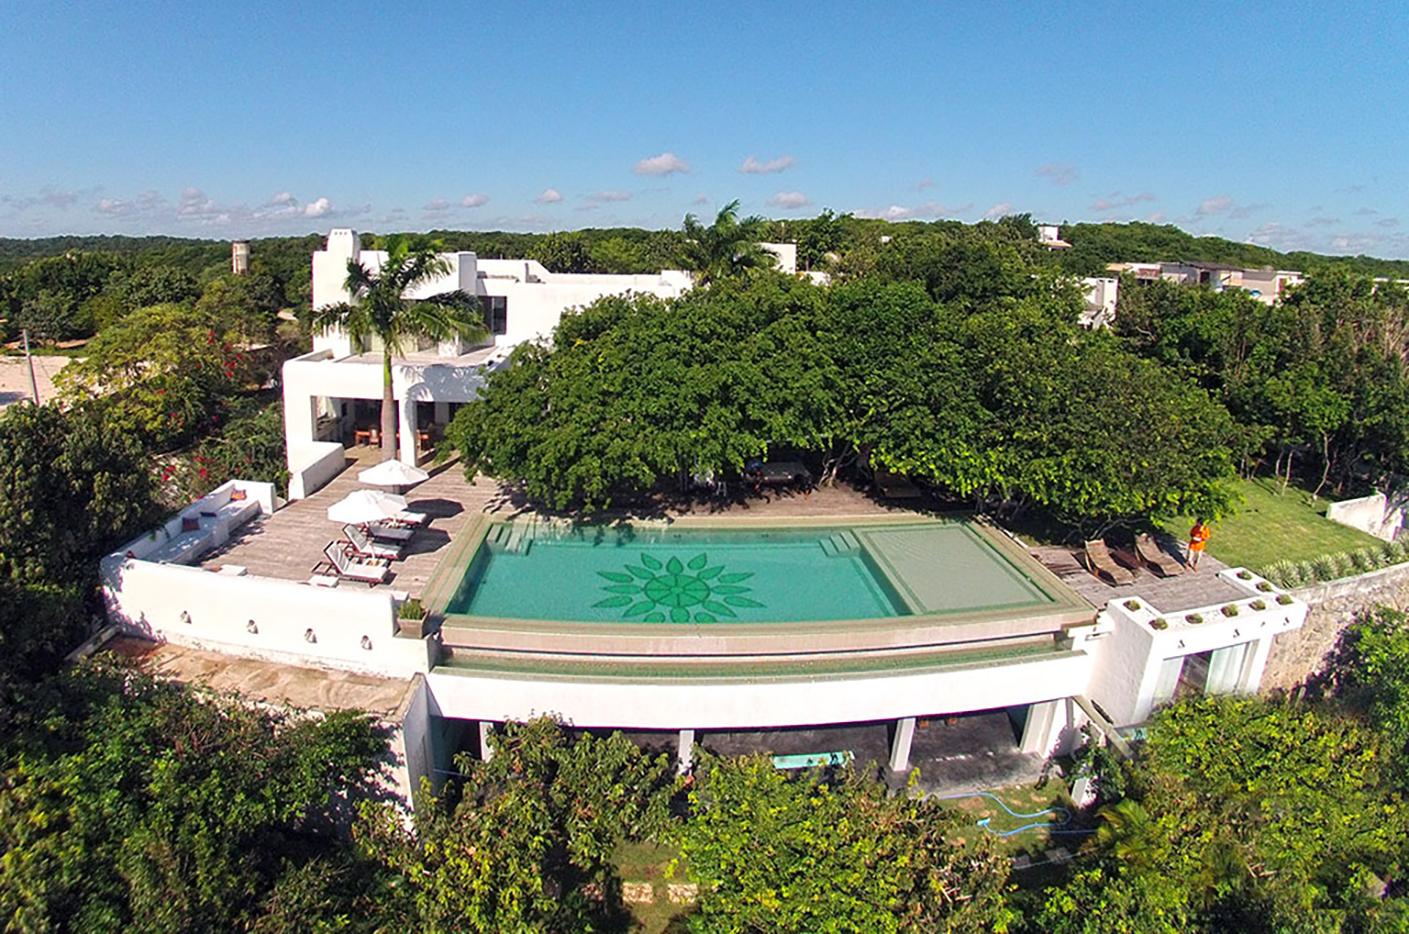 BRESIL<br />Praia de Pipa<br />Villa